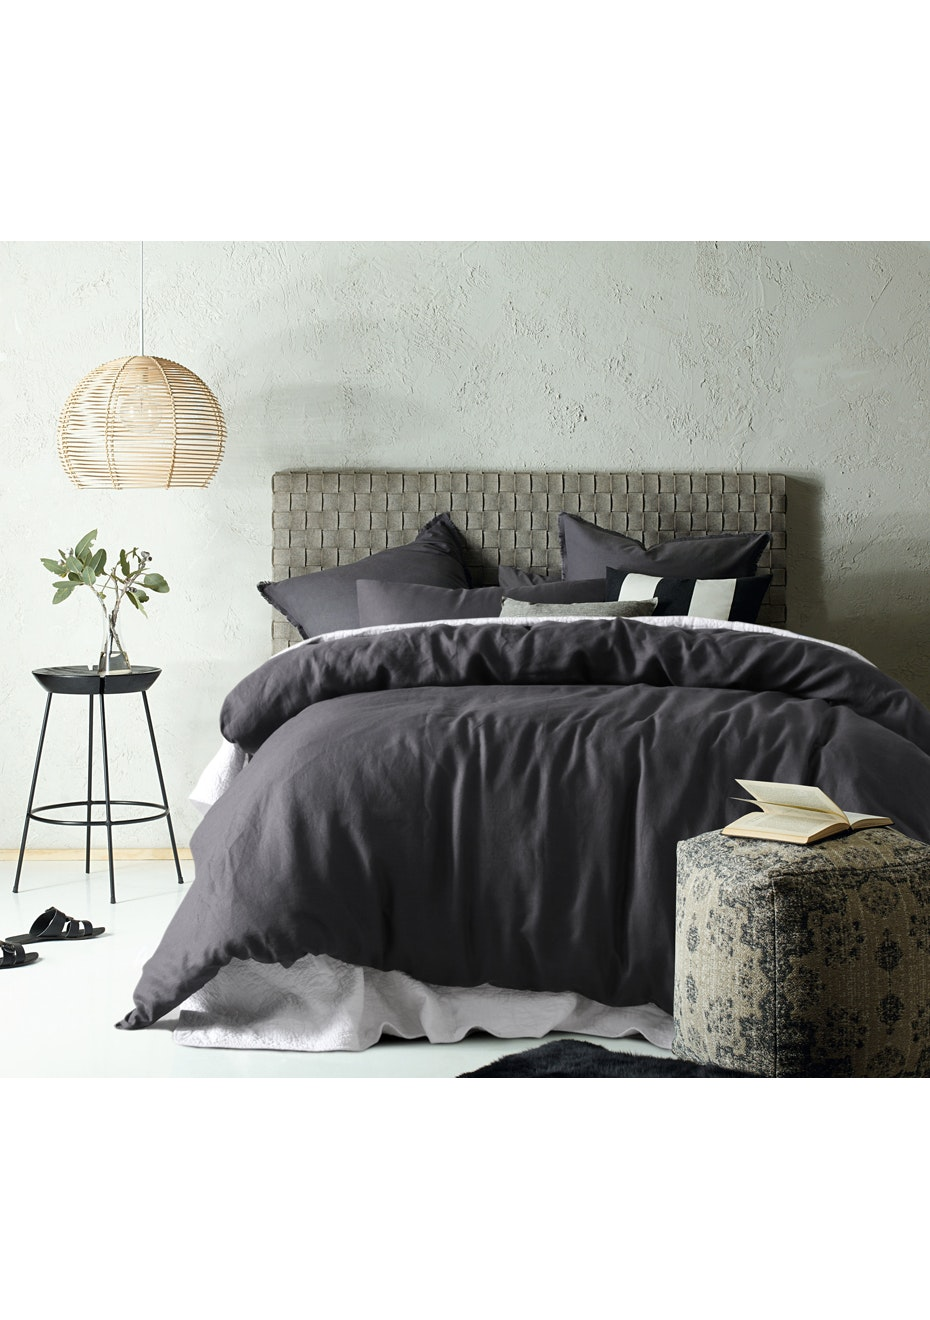 Linen/Cotton Slate Quilt Cover Set - King Bed